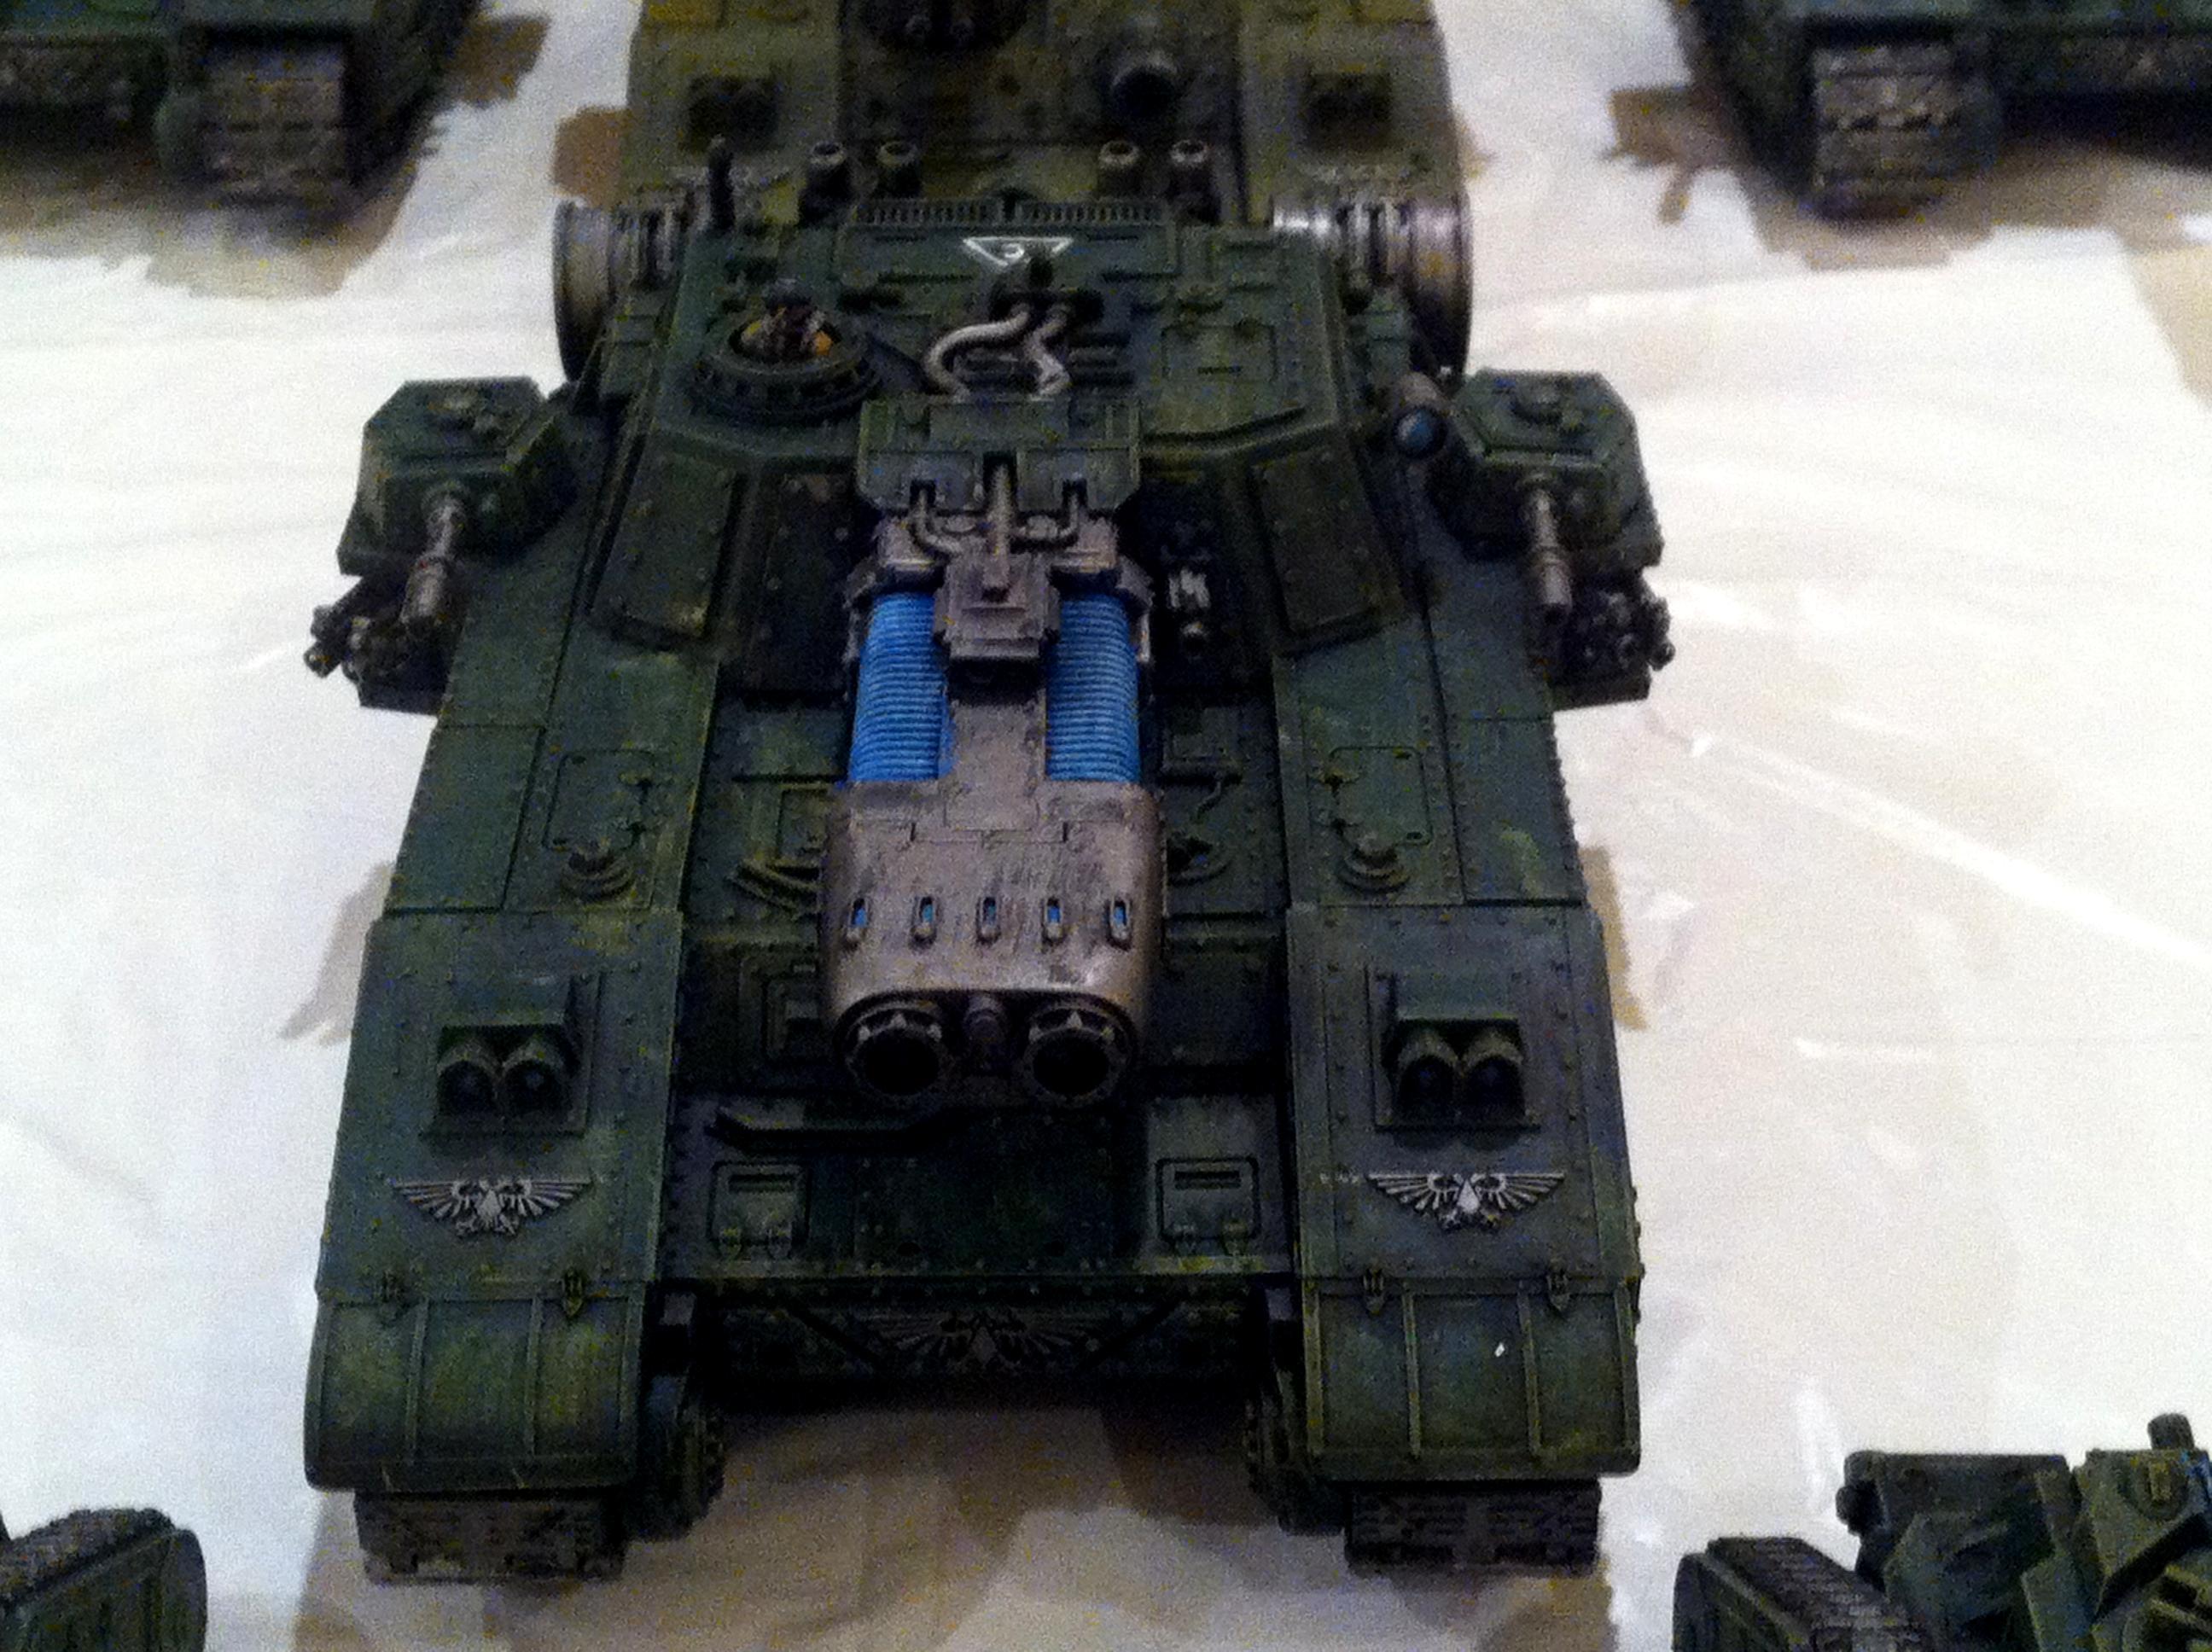 Armor, Baneblade, Company, Demolisher, Exceutioner, Leman Russ, Lr, Lrbt, Shadowsword, Stormblade, Super-heavy, Tank, Vanquisher